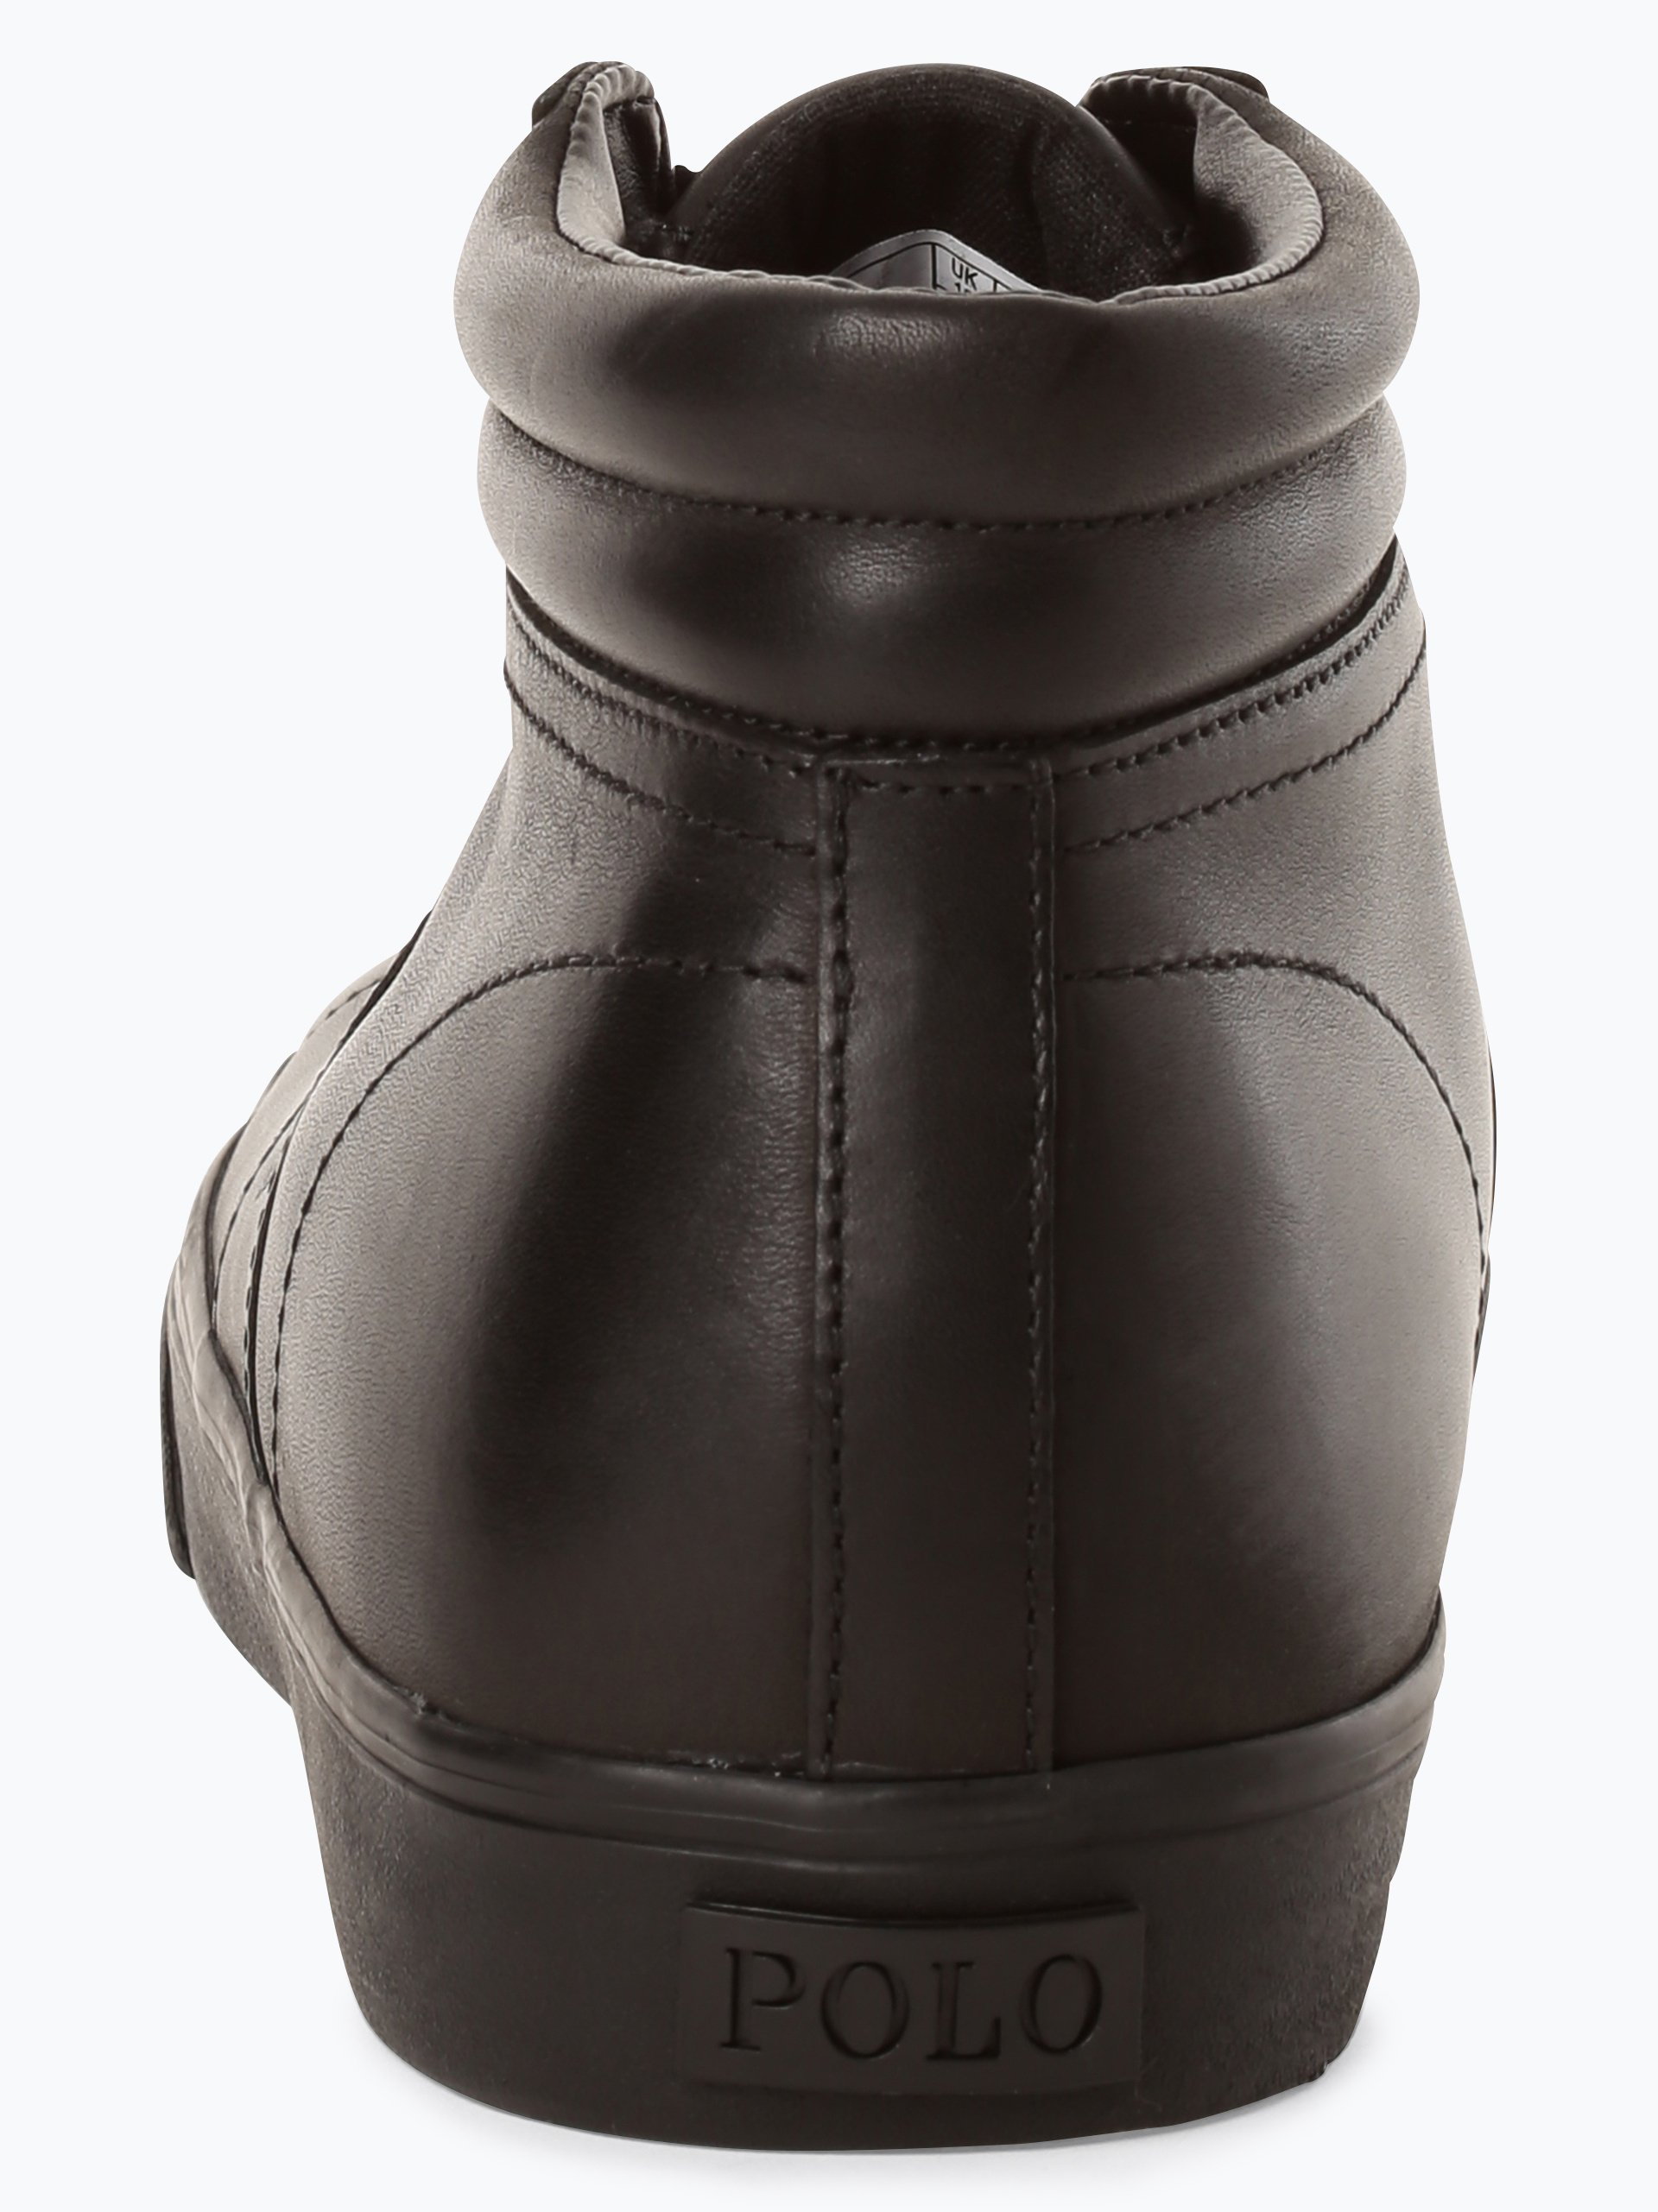 polo ralph lauren herren sneaker aus leder online kaufen. Black Bedroom Furniture Sets. Home Design Ideas